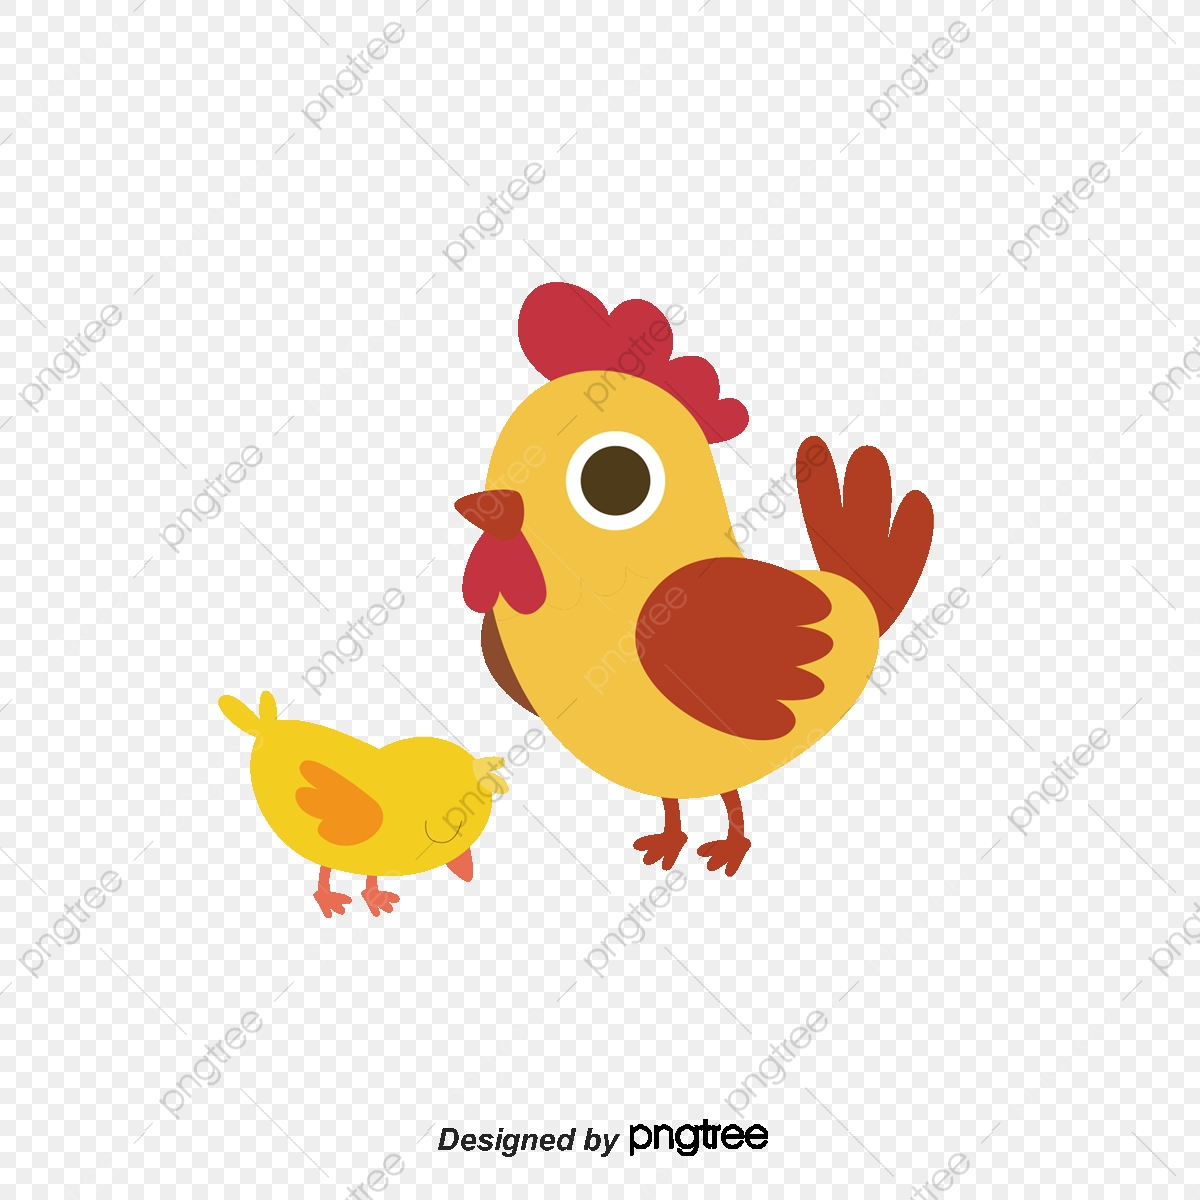 Cute Hen And Little Yellow Chicken, Chicken Vector, Vector Material.